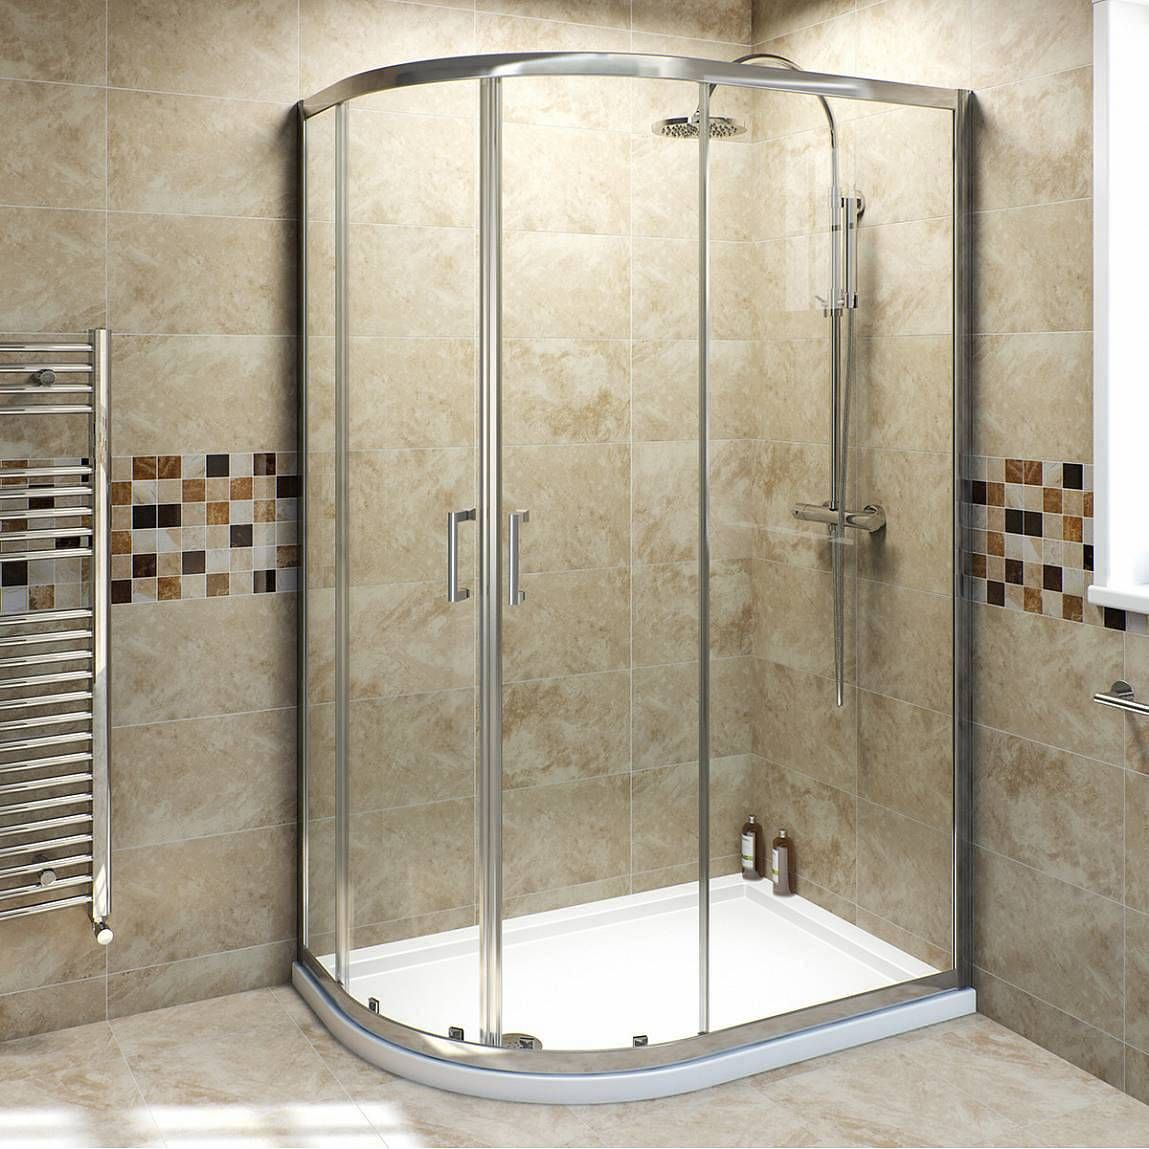 Curved Shower Enclosures Victoriaplum Com Quadrant Shower Quadrant Shower Enclosures Shower Enclosure